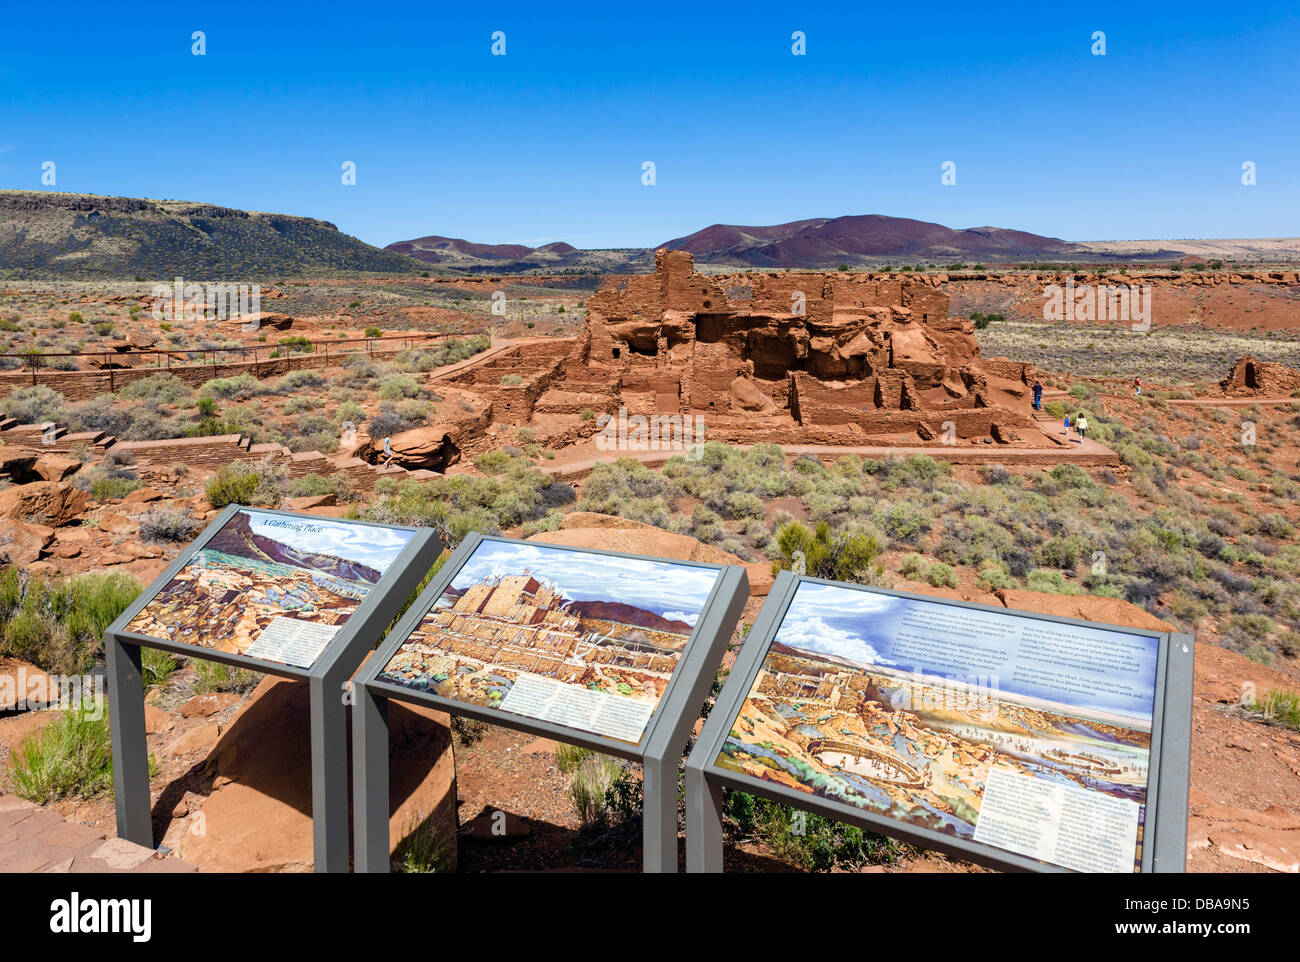 The Wupatki Pueblo, pueblo indian ruins in Wupatki National Monument, near Flagstaff, Arizona, USA - Stock Image